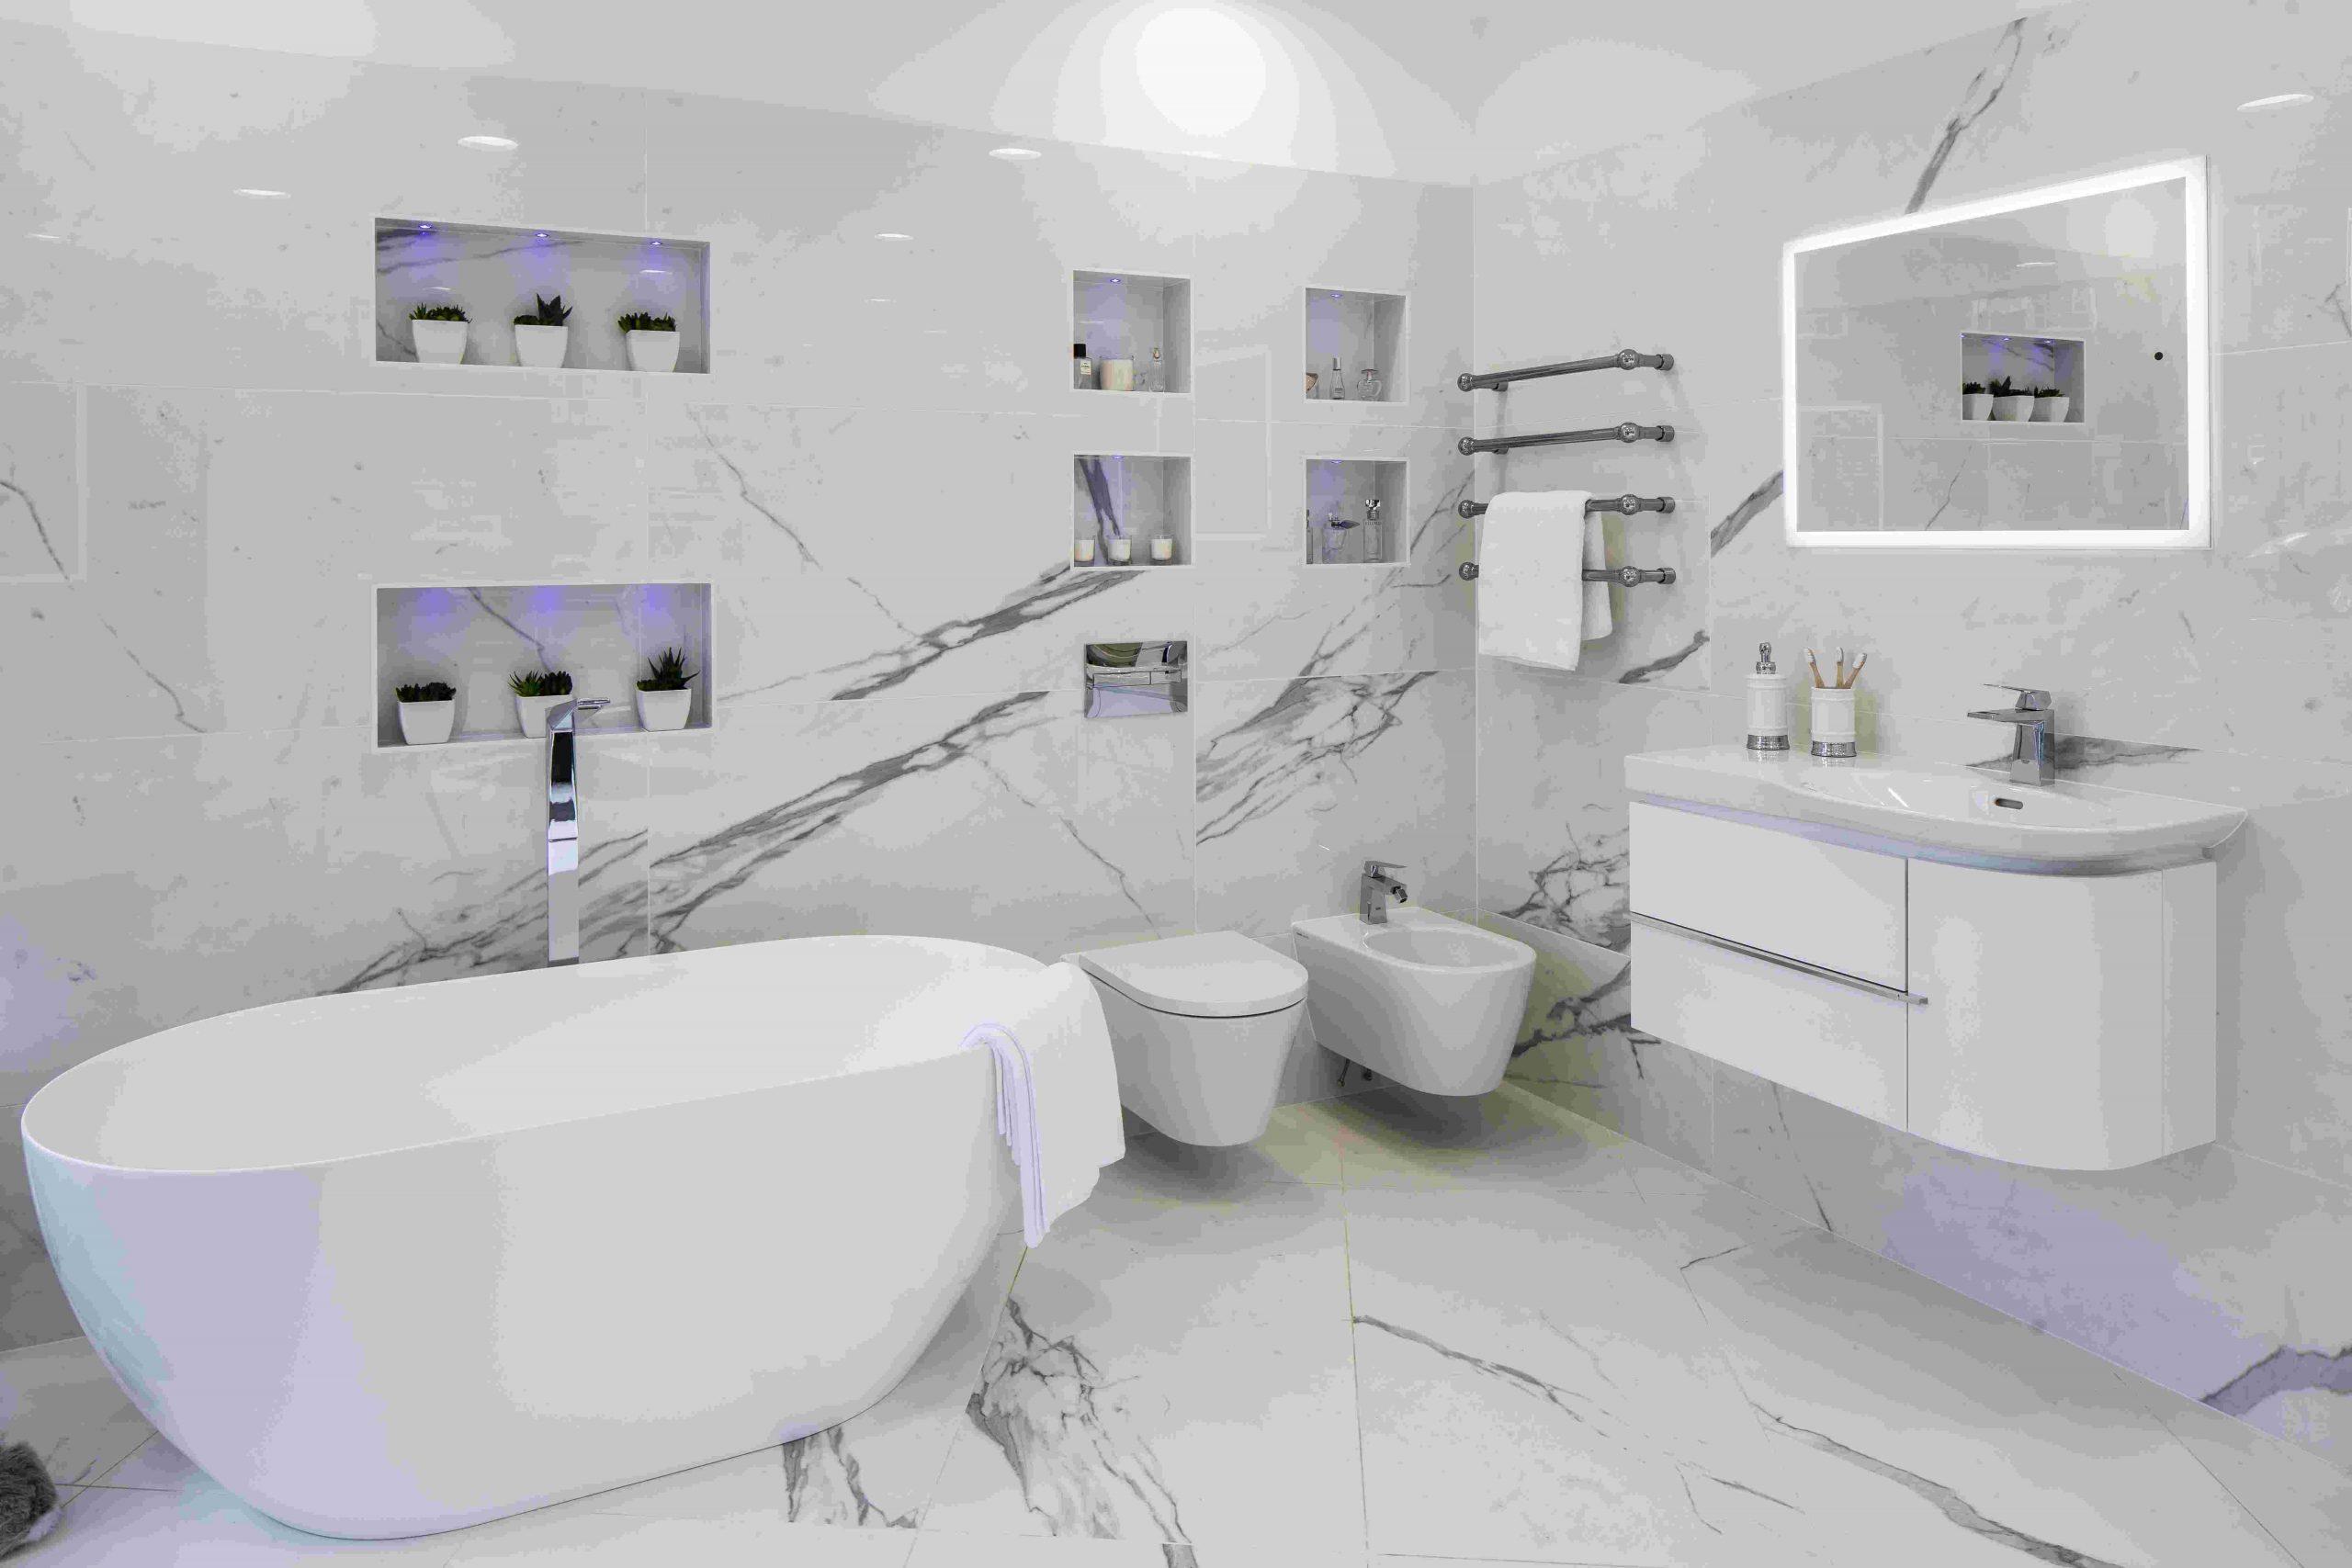 6 Creative Bathroom Storage Ideas